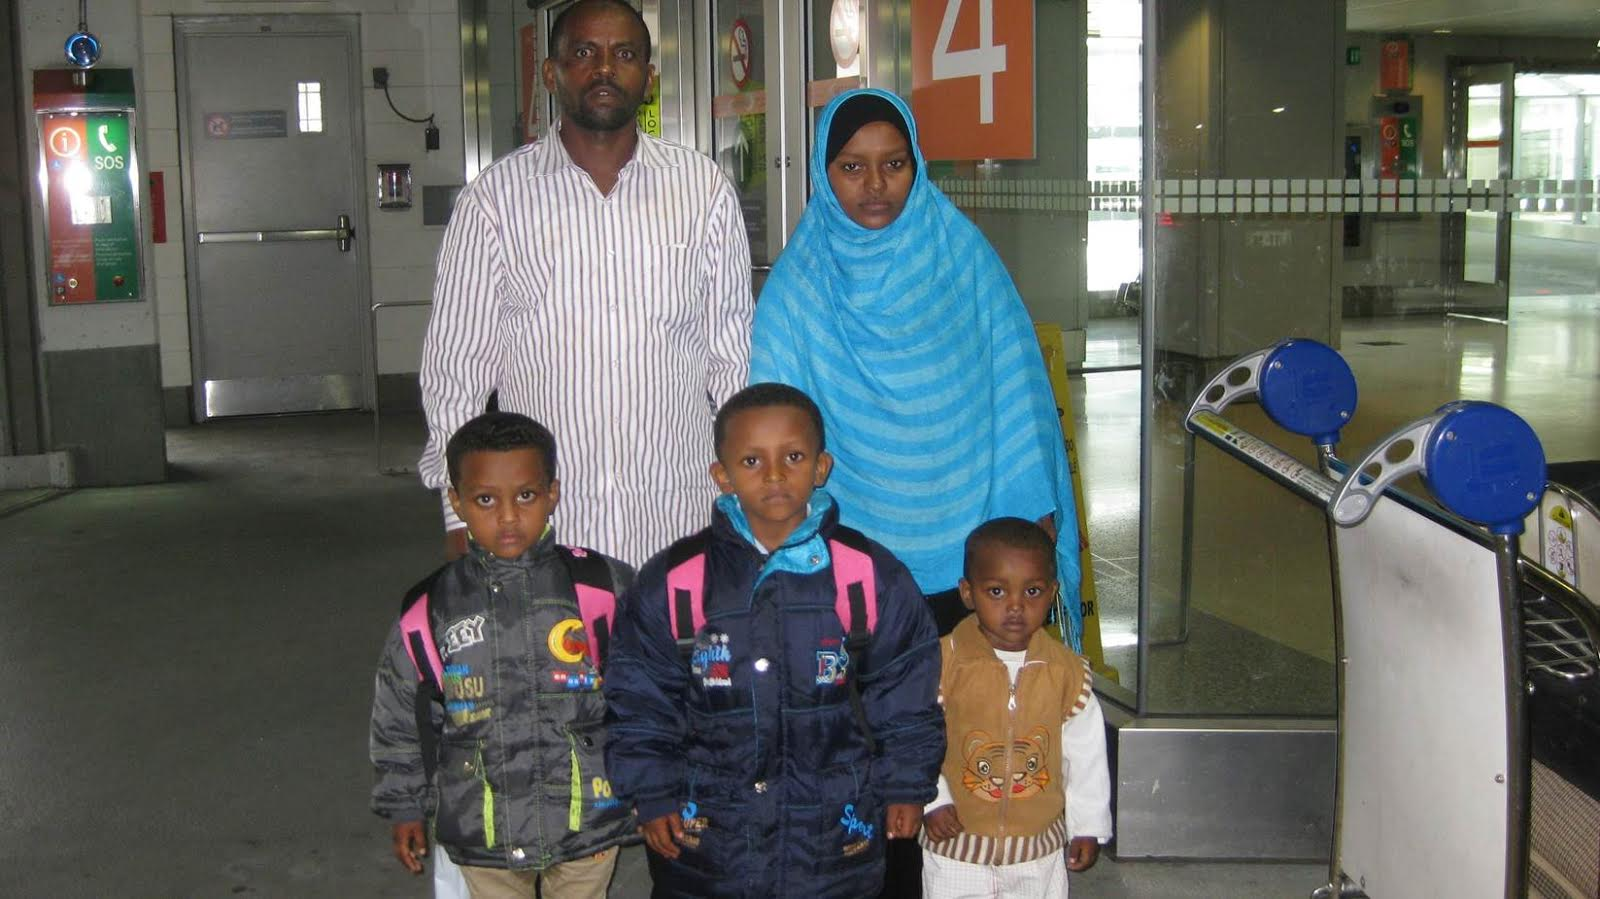 Mussanour Family